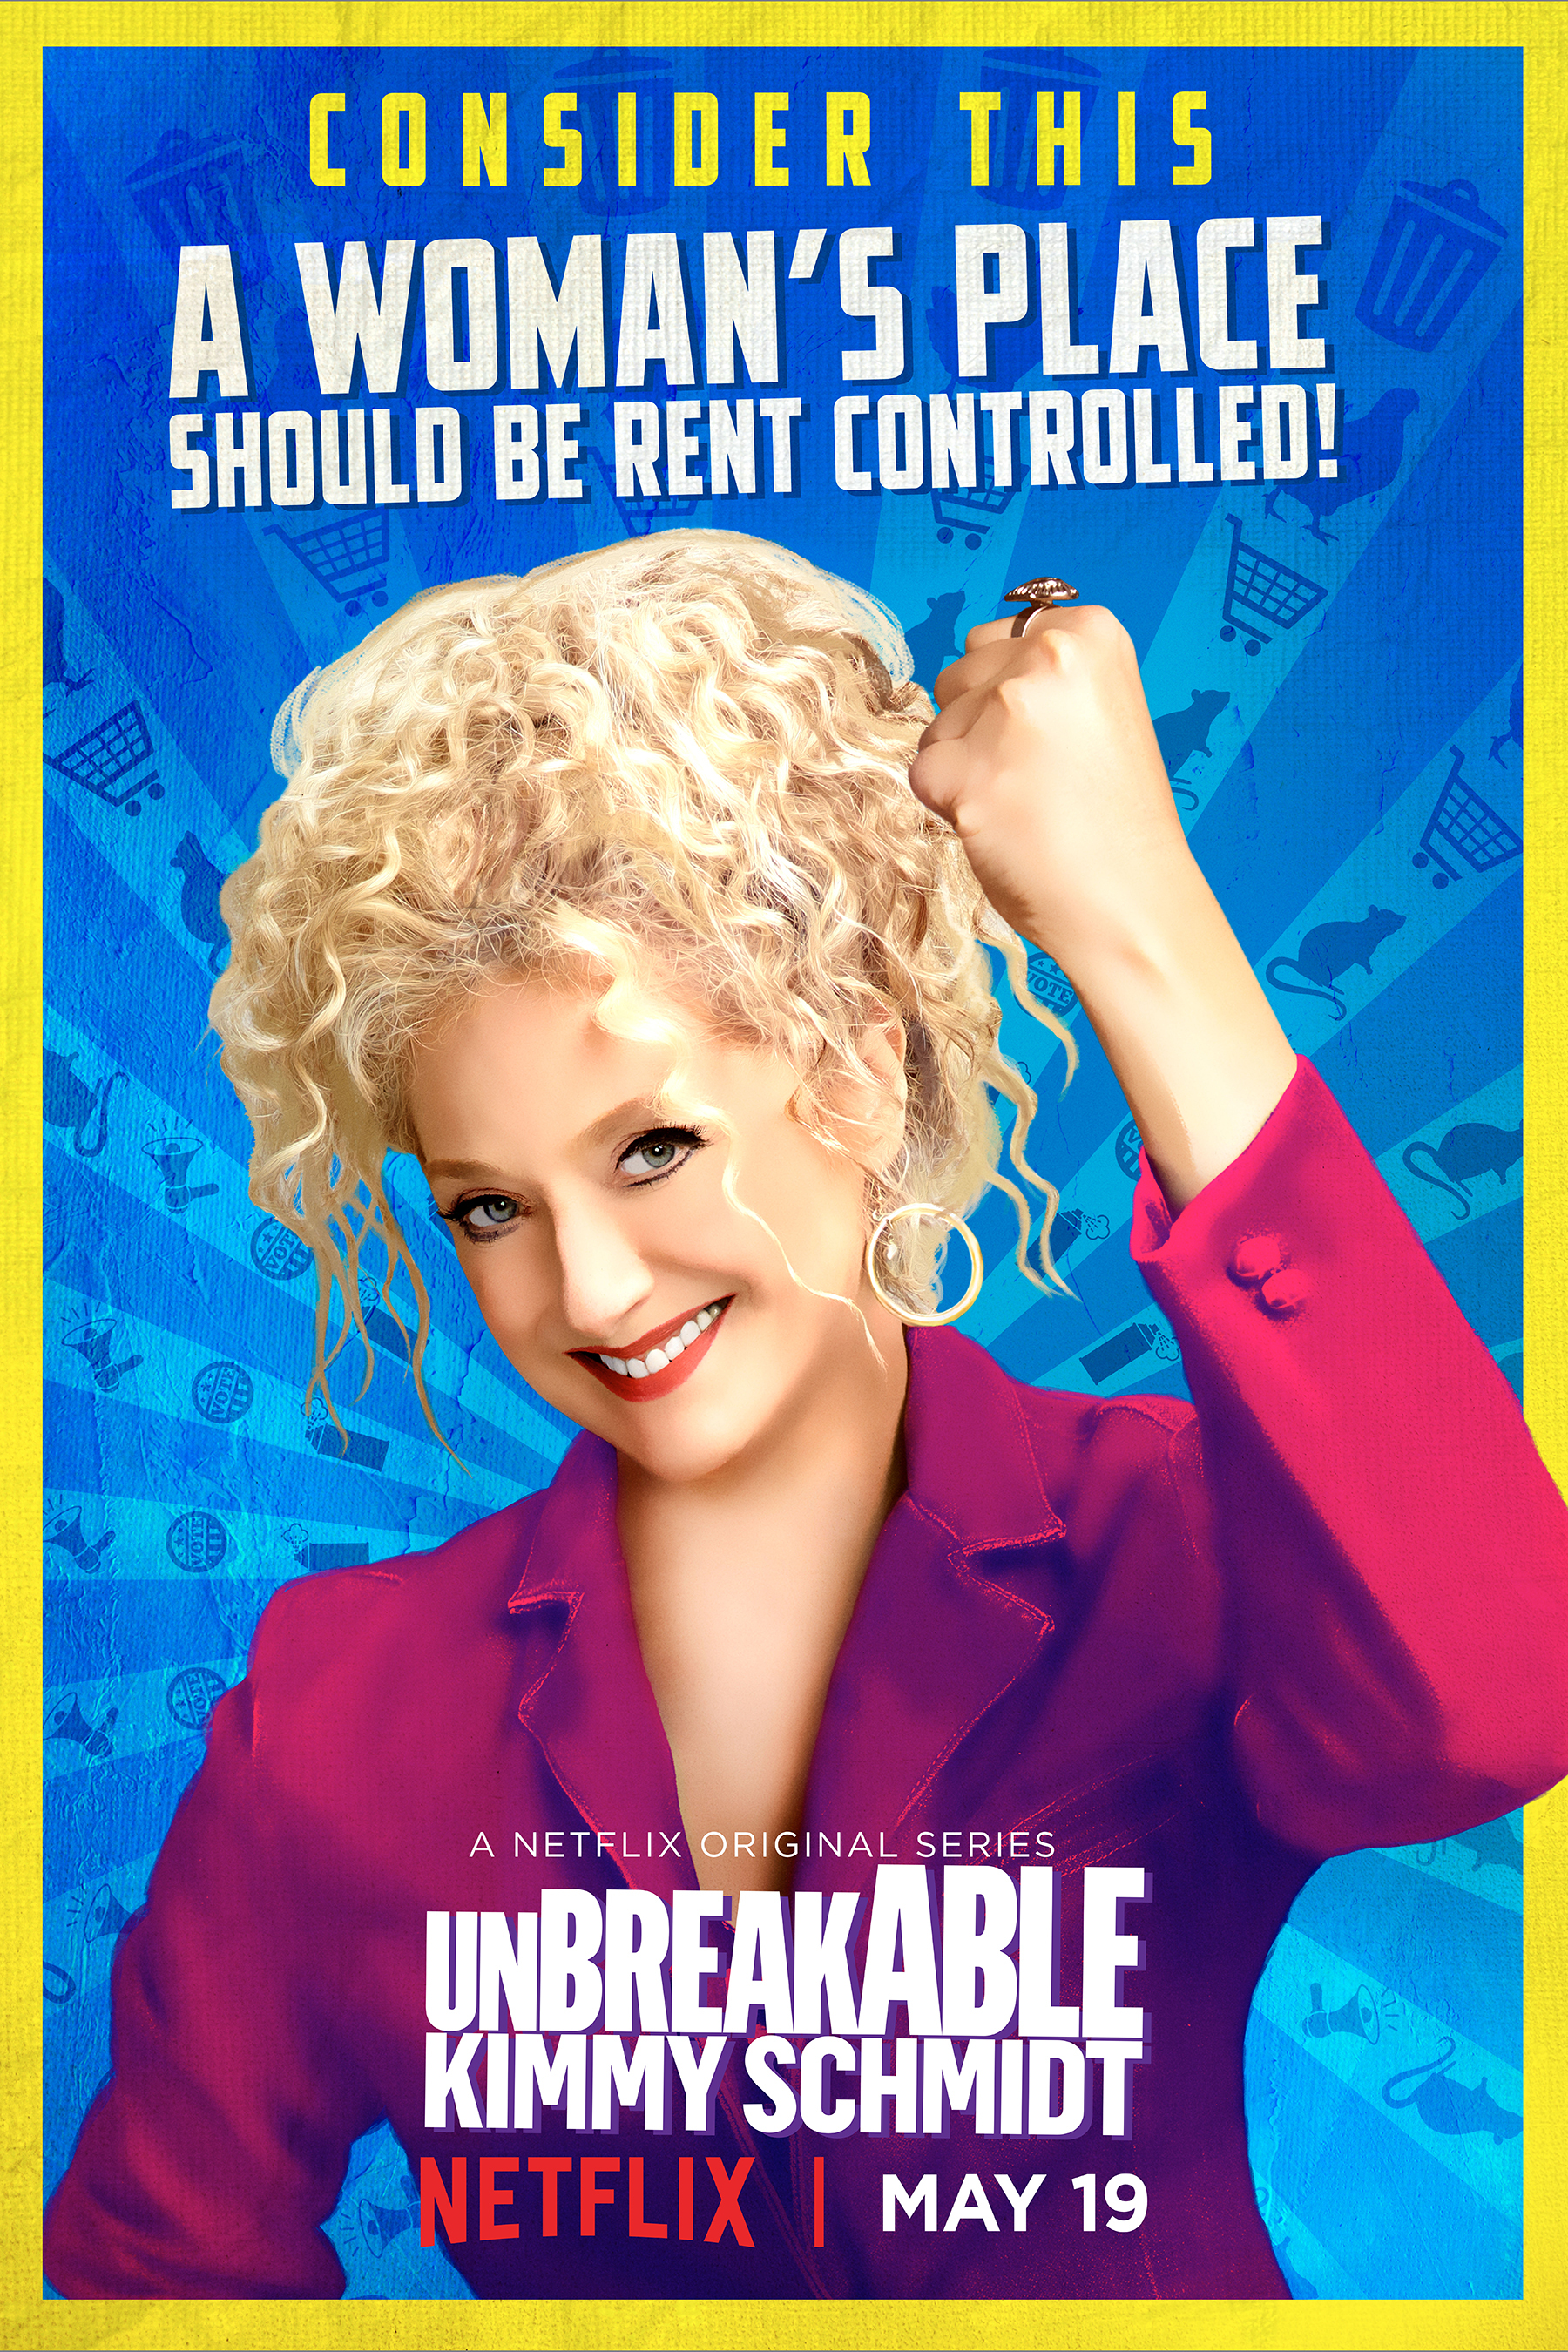 Unbreakable Kimmy Schmidt - Season 3 Poster - Lillian